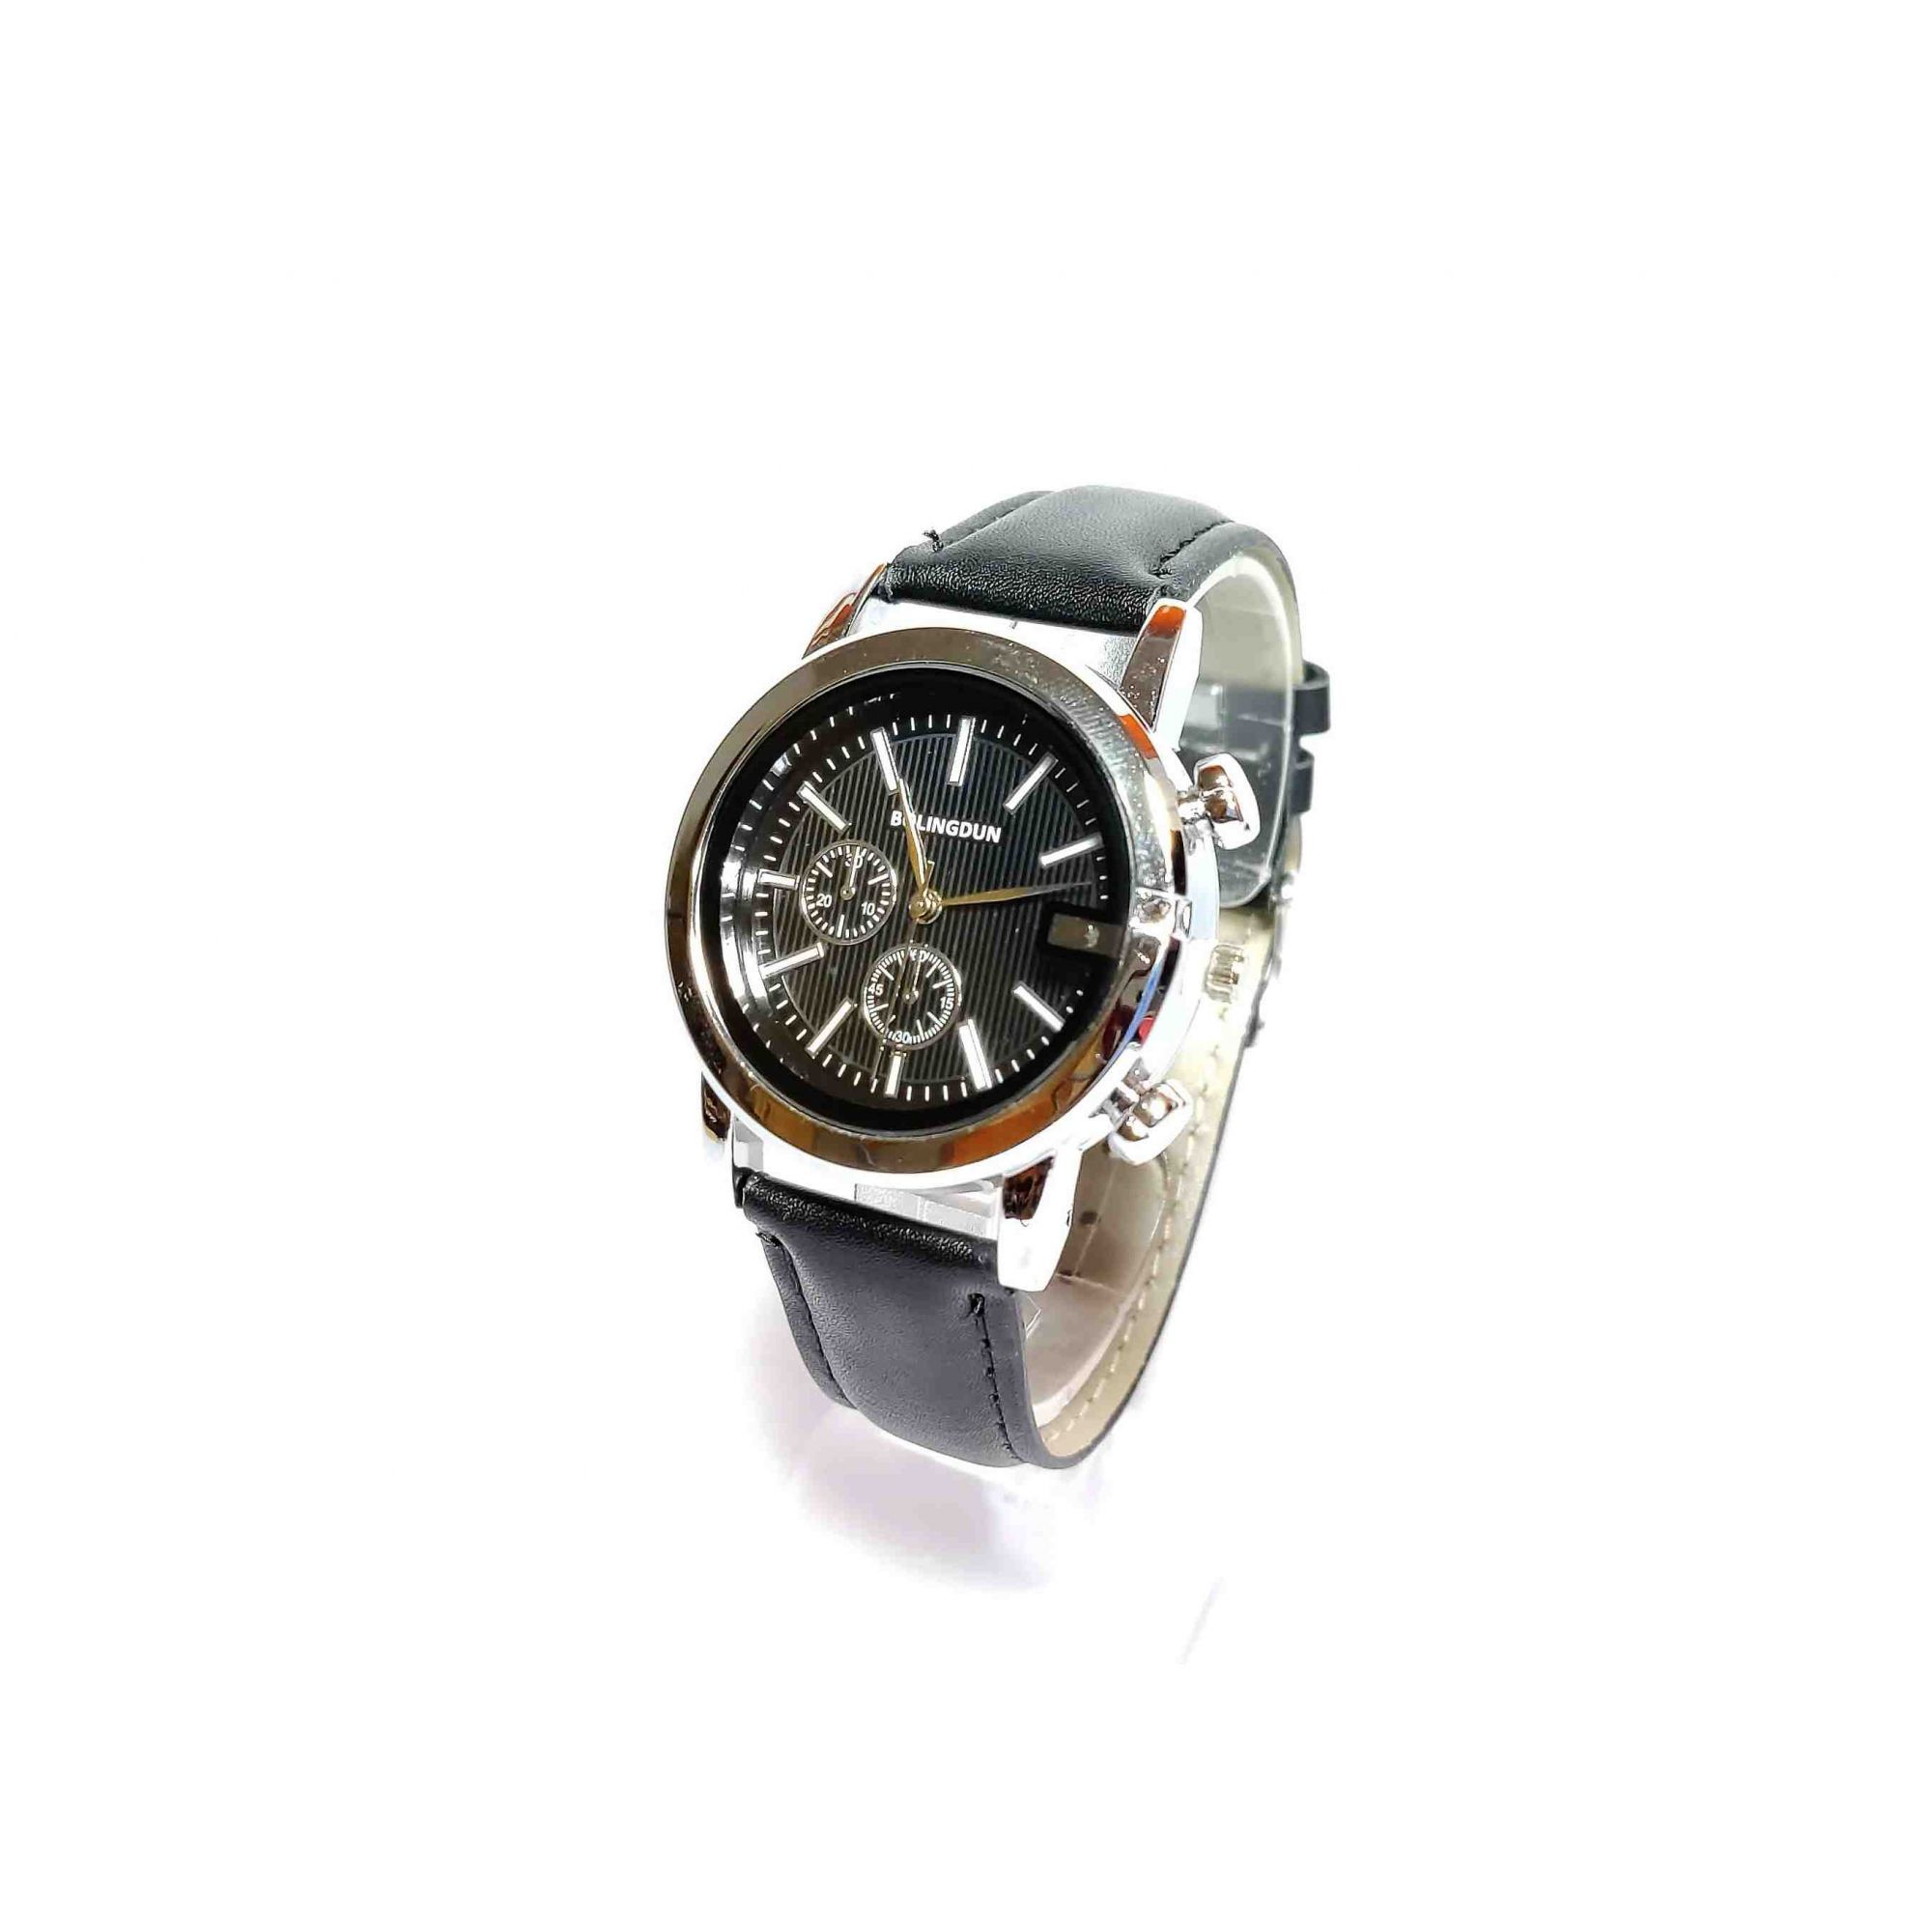 Relógio Masculino Retro Quartz Pulseira de Couro Preto